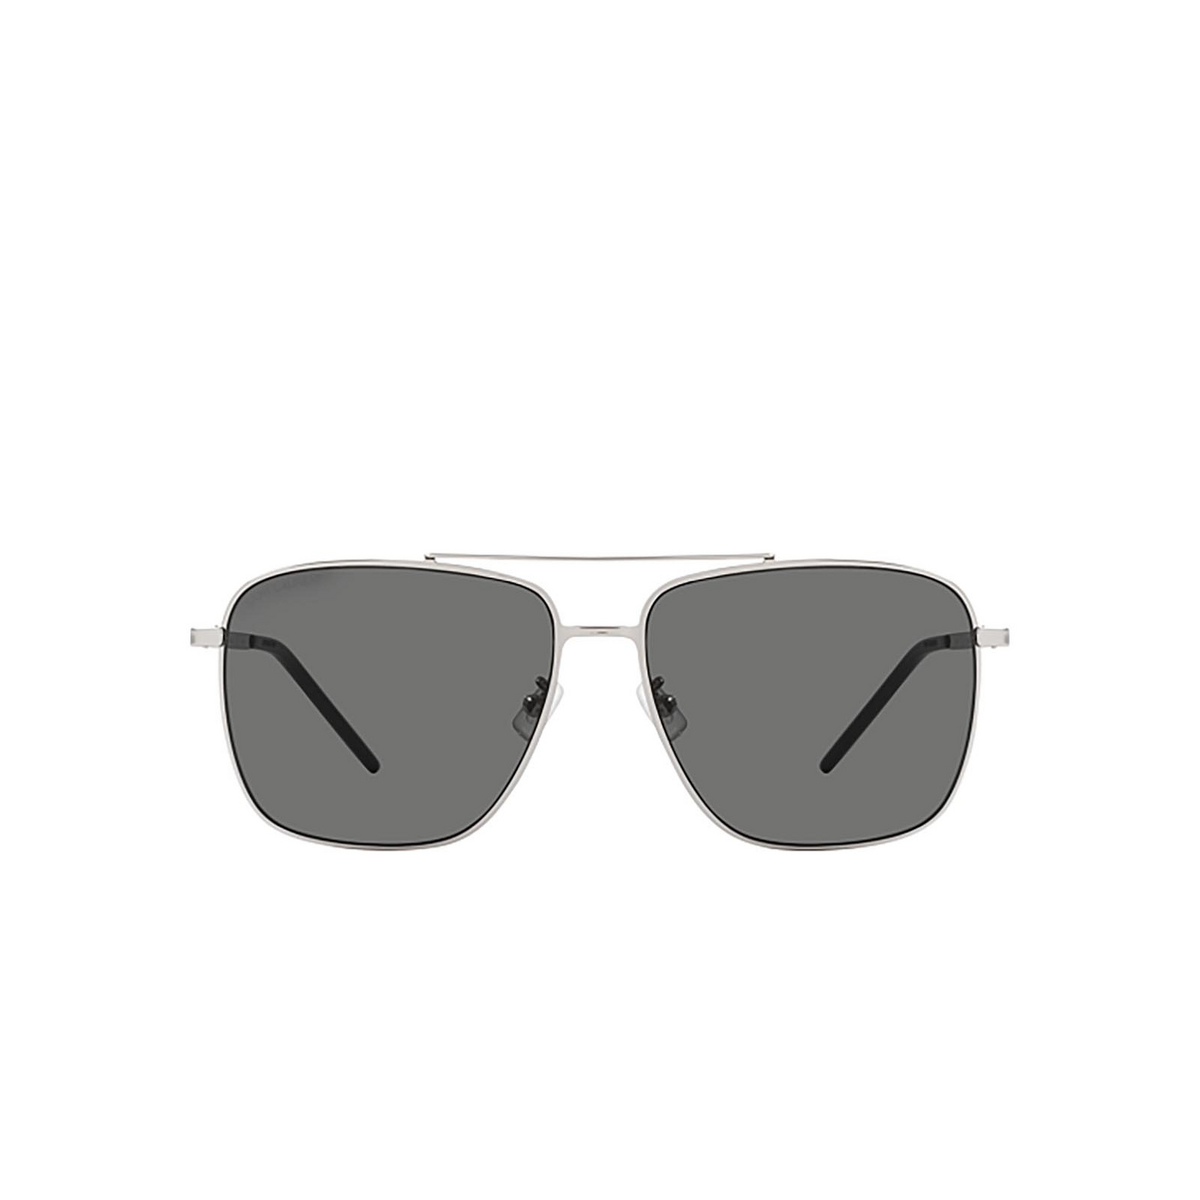 Saint Laurent® Aviator Sunglasses: SL 376 SLIM color Silver 001 - 1/2.